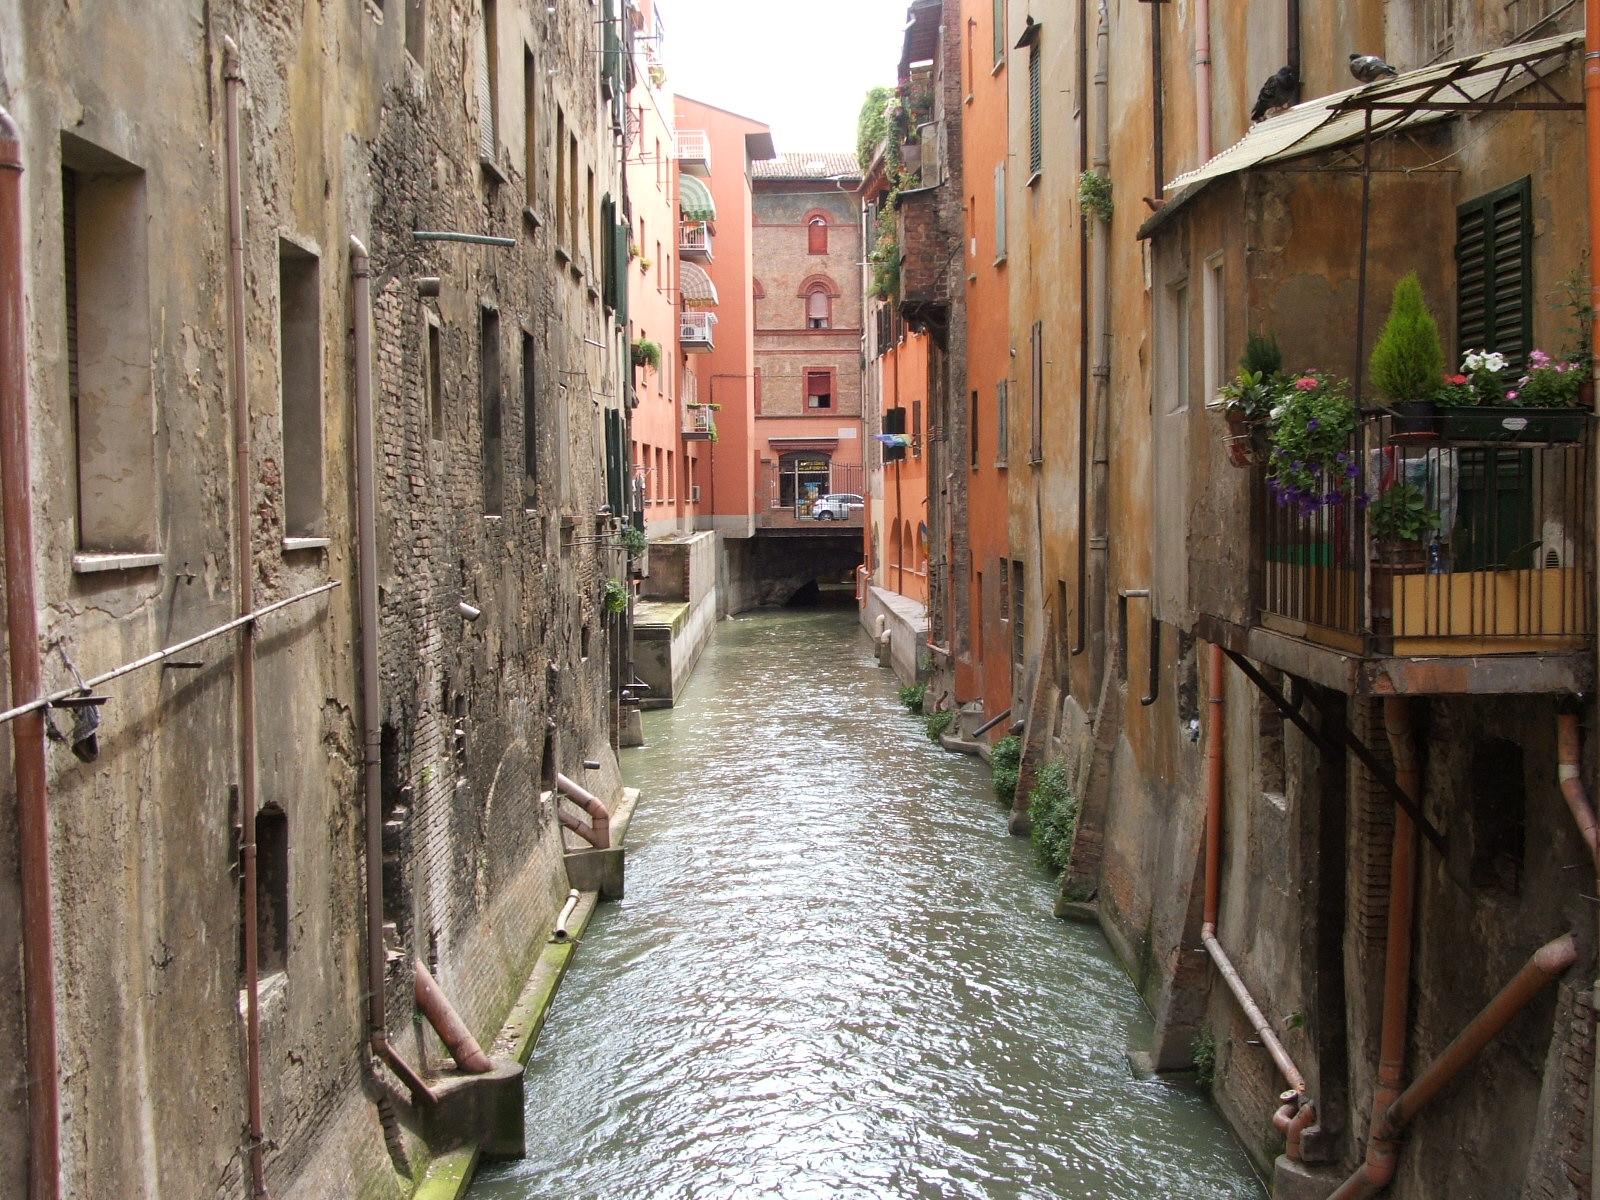 https://i2.wp.com/upload.wikimedia.org/wikipedia/commons/5/50/Bologna-Canale_a_San_Vitale-DSCF7127.JPG